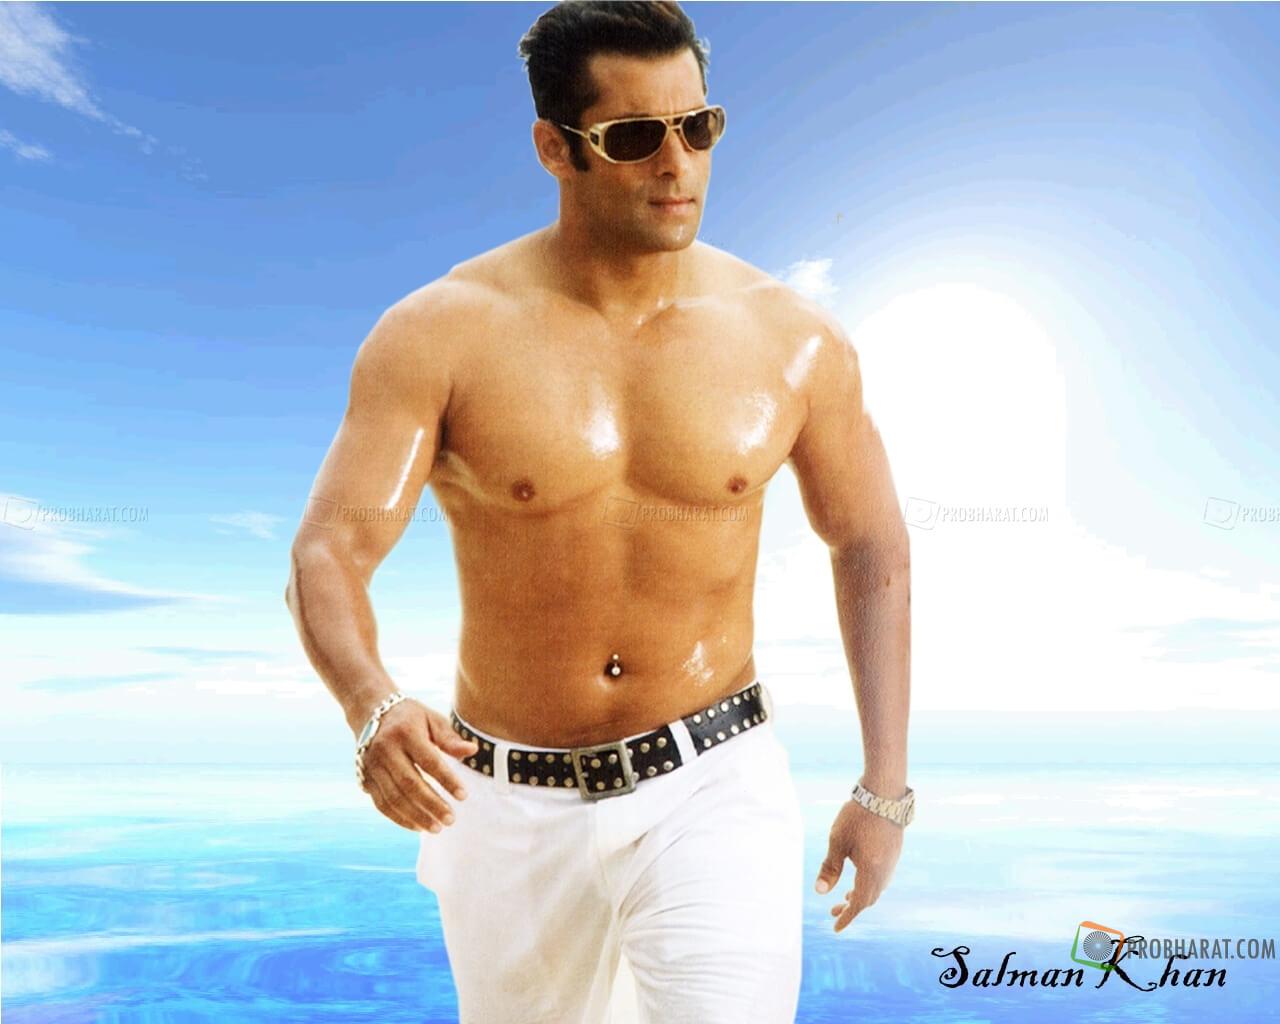 Salman Khan Photo, Age, News, Birthday, Height, Sister, Biography, Girlfriend, Awards, Address, Song, Video, Net Worth, Education, Twitter, Instagram, Facebook, Wiki, Imdb, Website, Youtube (52)